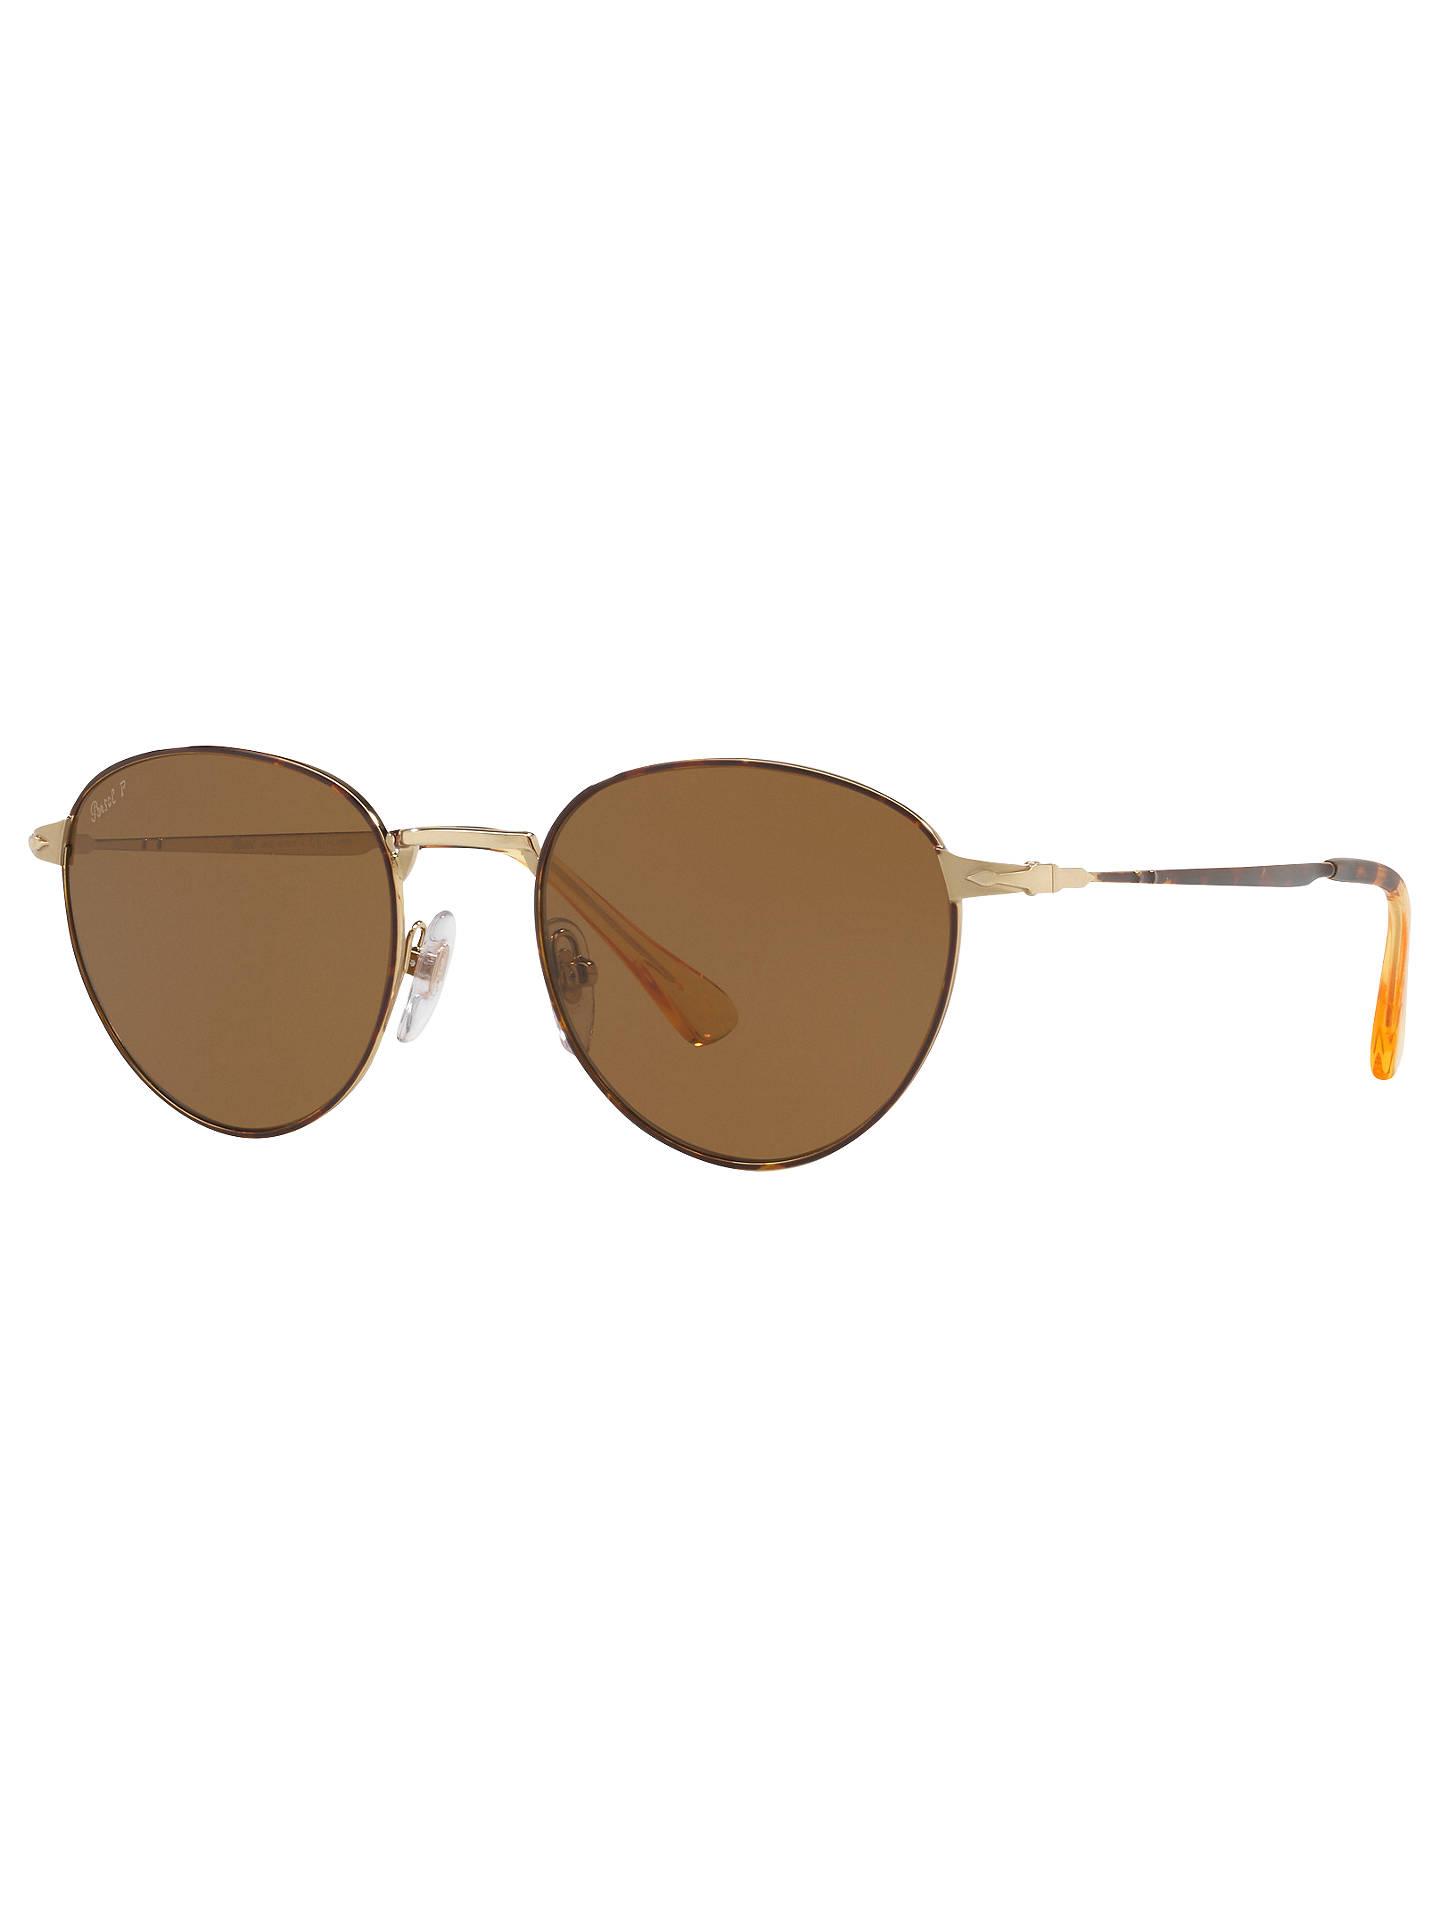 9e94ad8c65 Persol PO2445S Polarised Oval Sunglasses at John Lewis   Partners